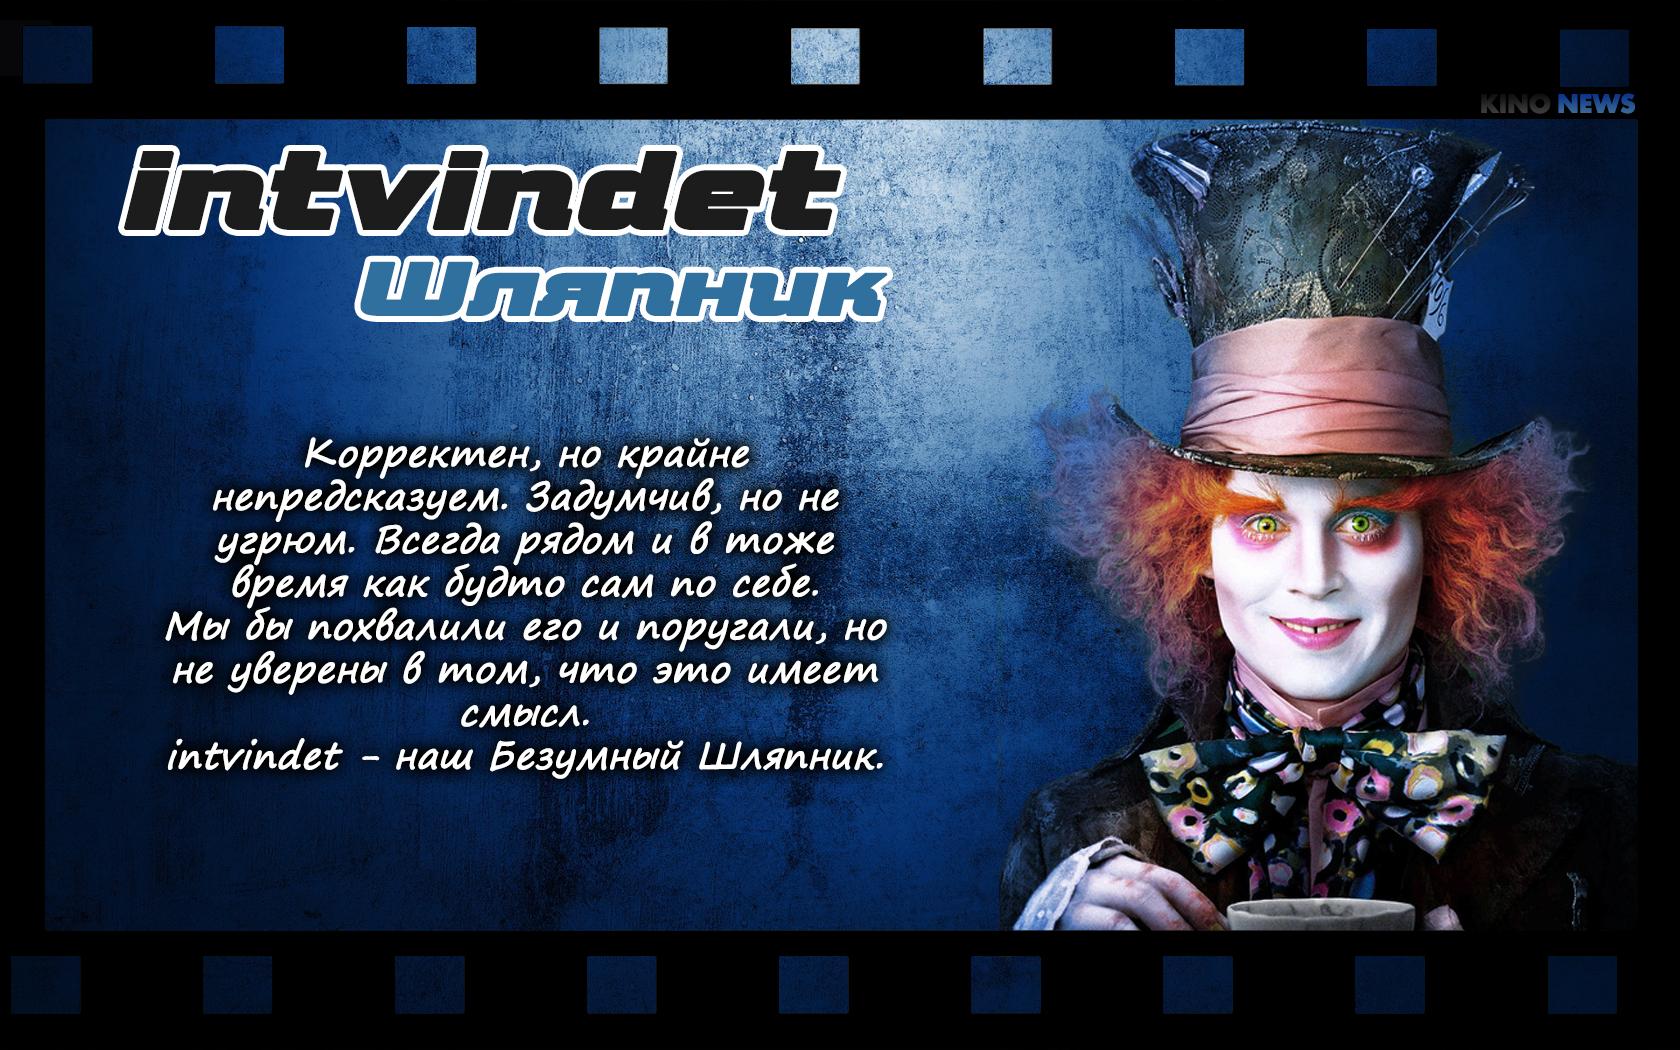 https://www.kinonews.ru/insimgs/2017/persimg/persimg77944_13.jpg